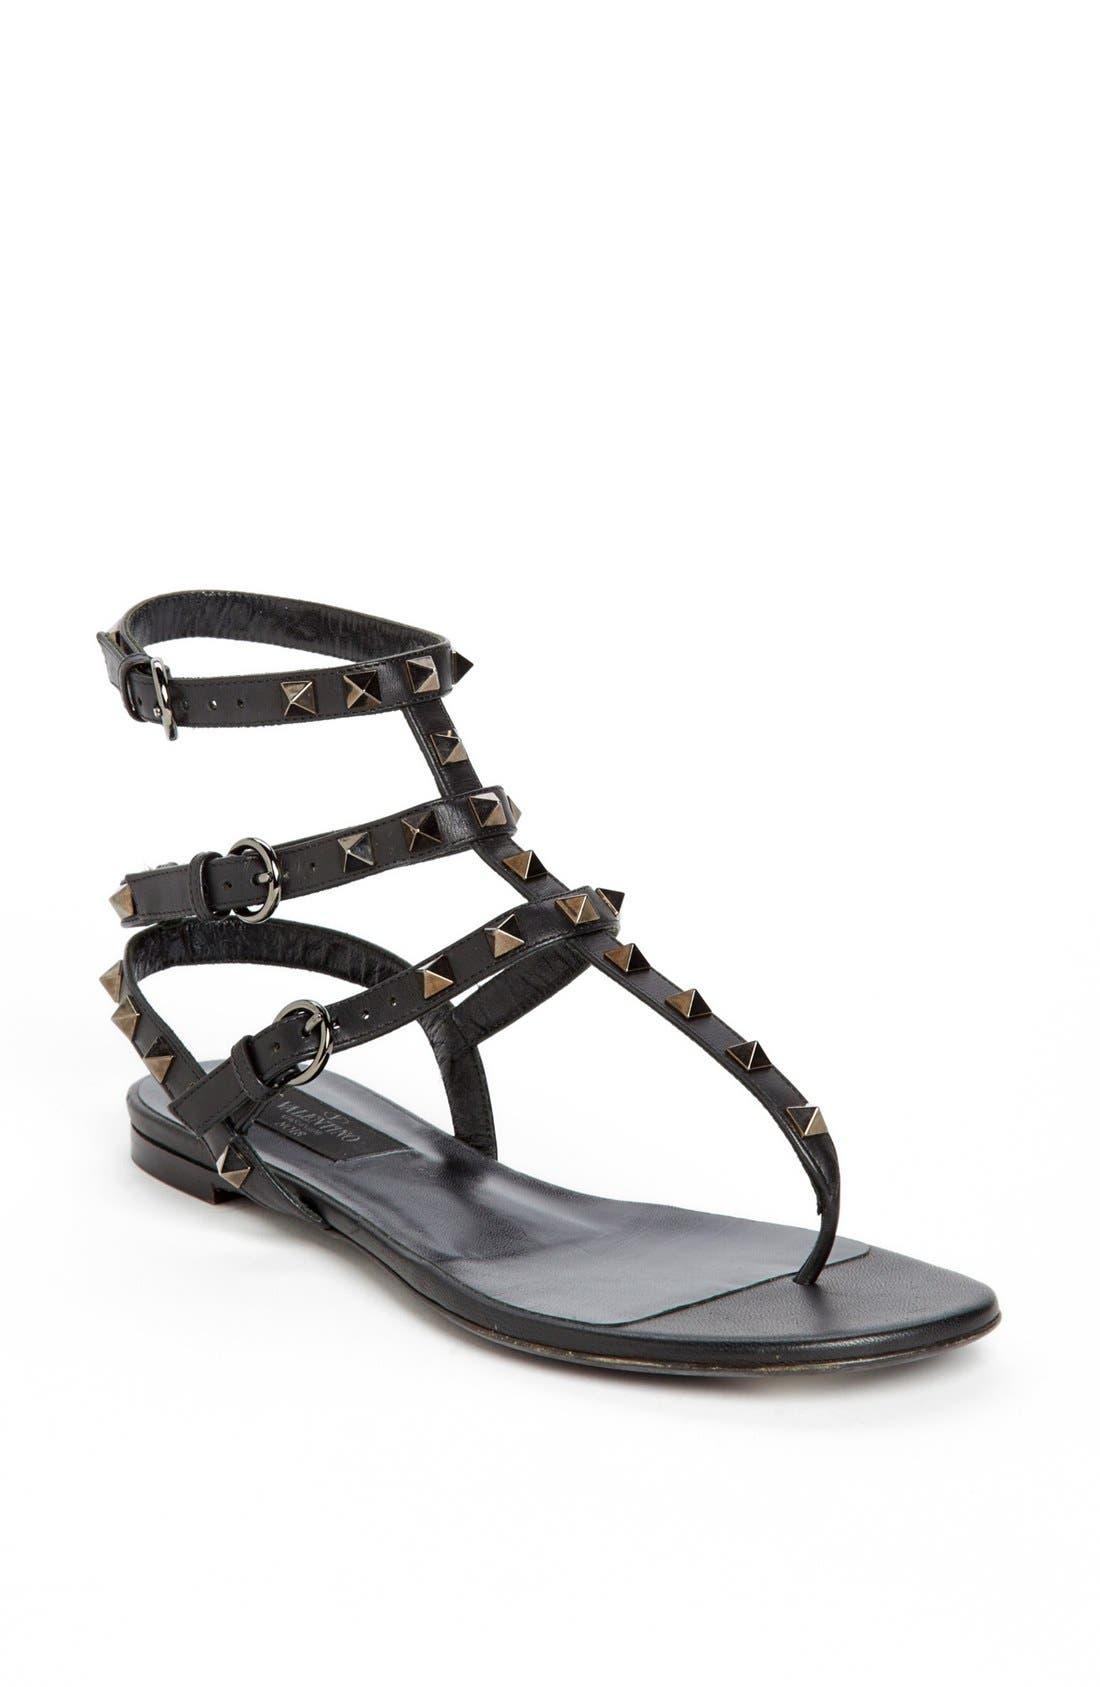 Alternate Image 1 Selected - Valentino 'Noir Rockstud' Thong Sandal